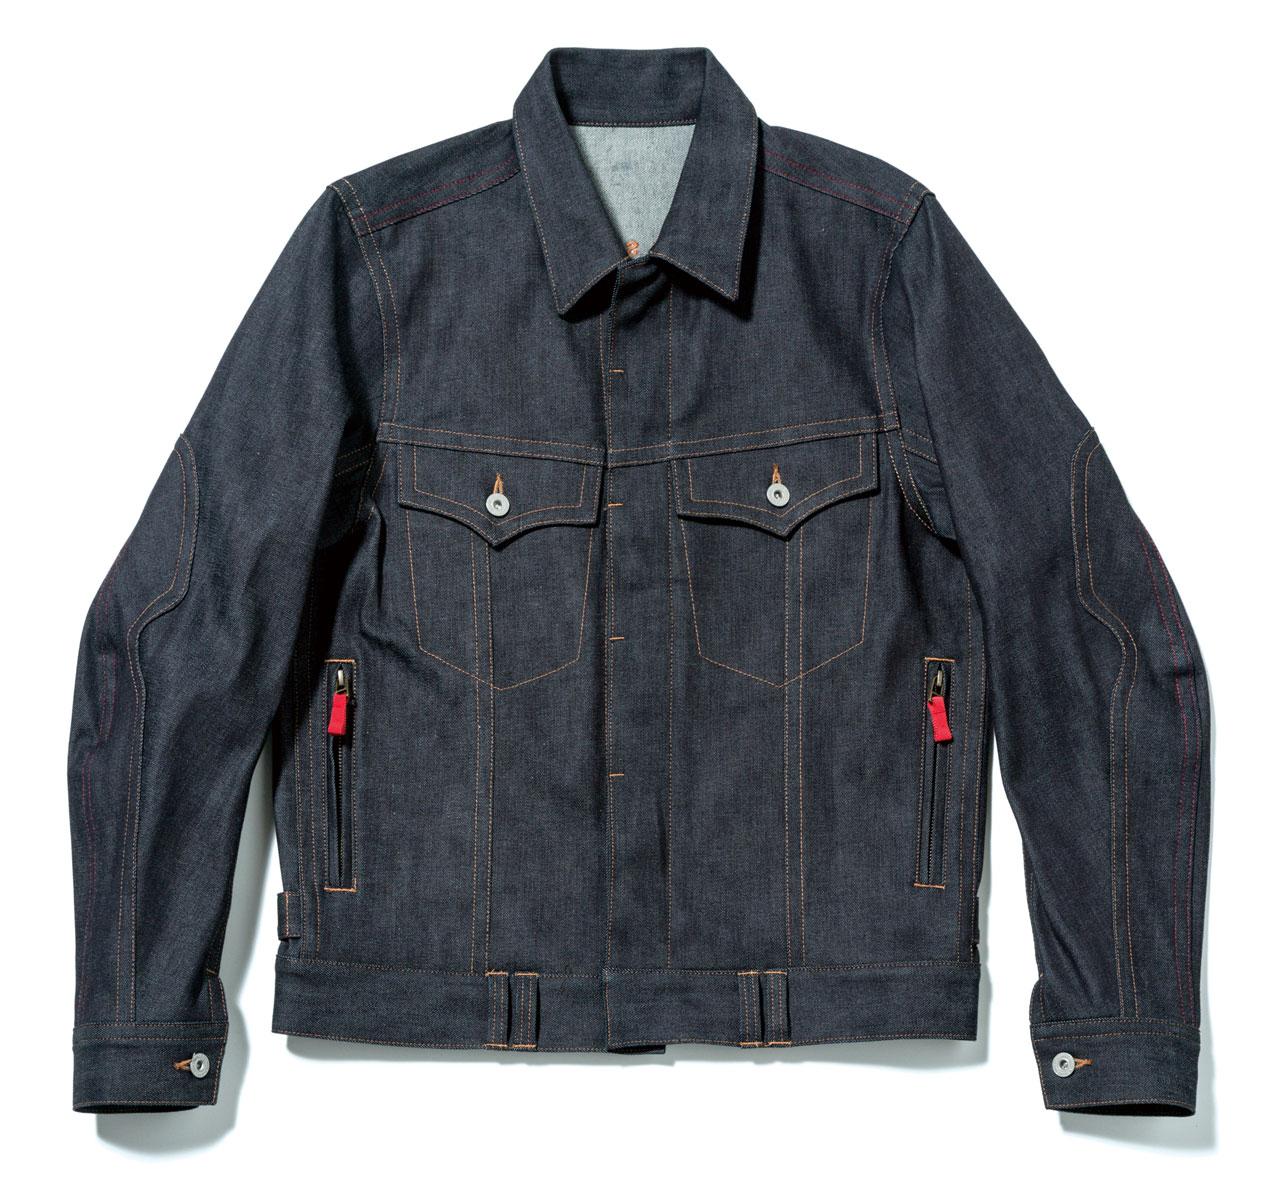 【HONDA RIDING GEAR】【HONDA×SHINICHIRO ARAKAWA】丹寧牛仔 布勞森外套 - 「Webike-摩托百貨」